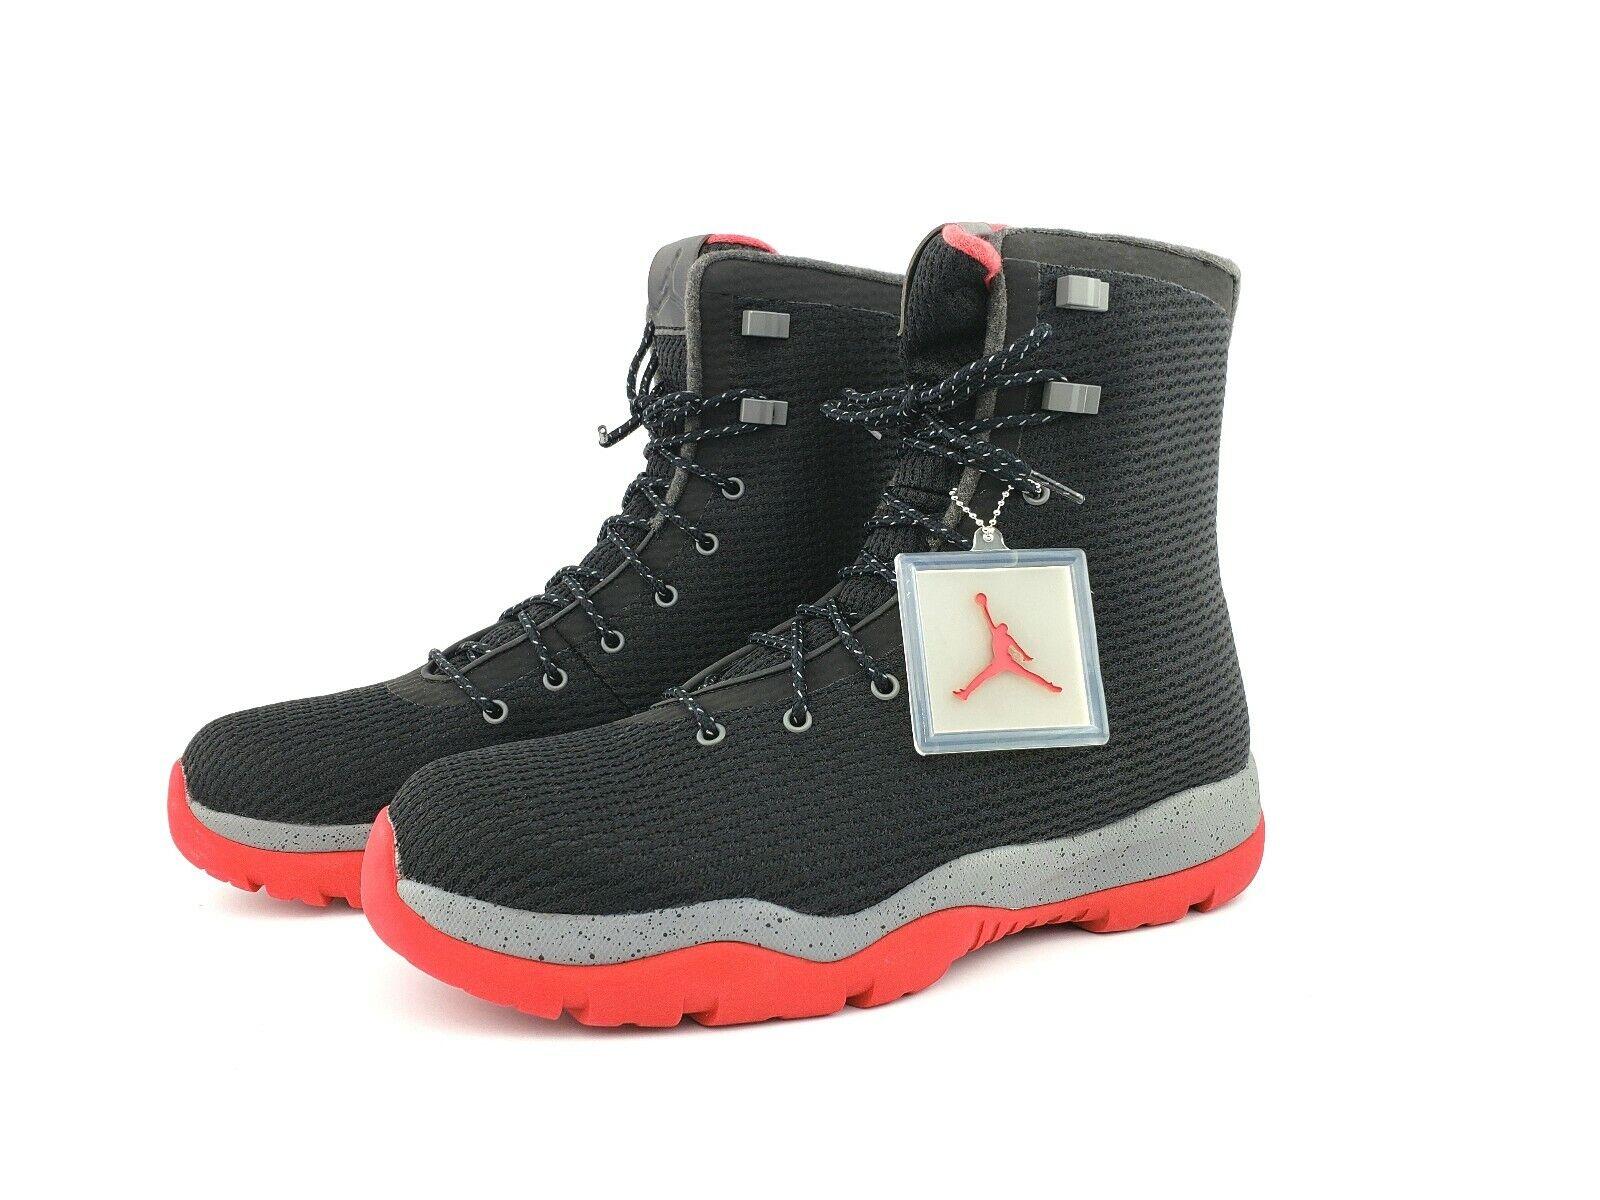 Nike Air Jordan Future Boot Black Red Mens Sneaker Boots Sz 12.0 New 854554-001